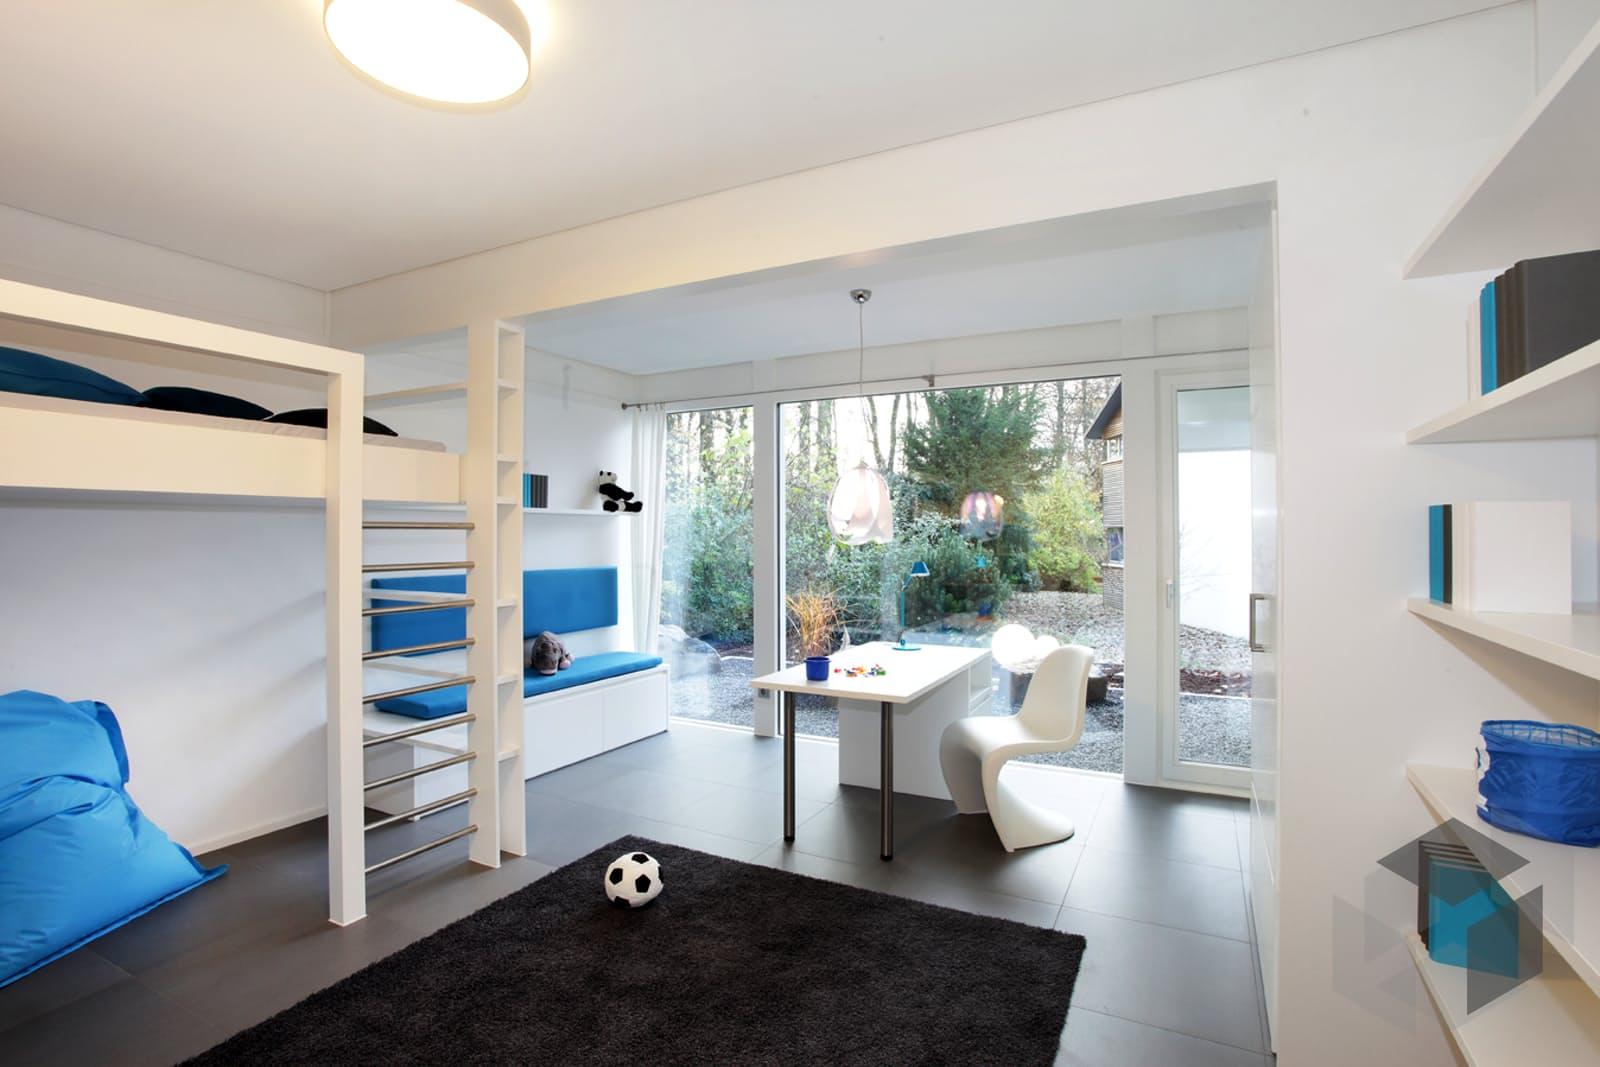 musterhaus bad vilbel von davinci haus komplette. Black Bedroom Furniture Sets. Home Design Ideas